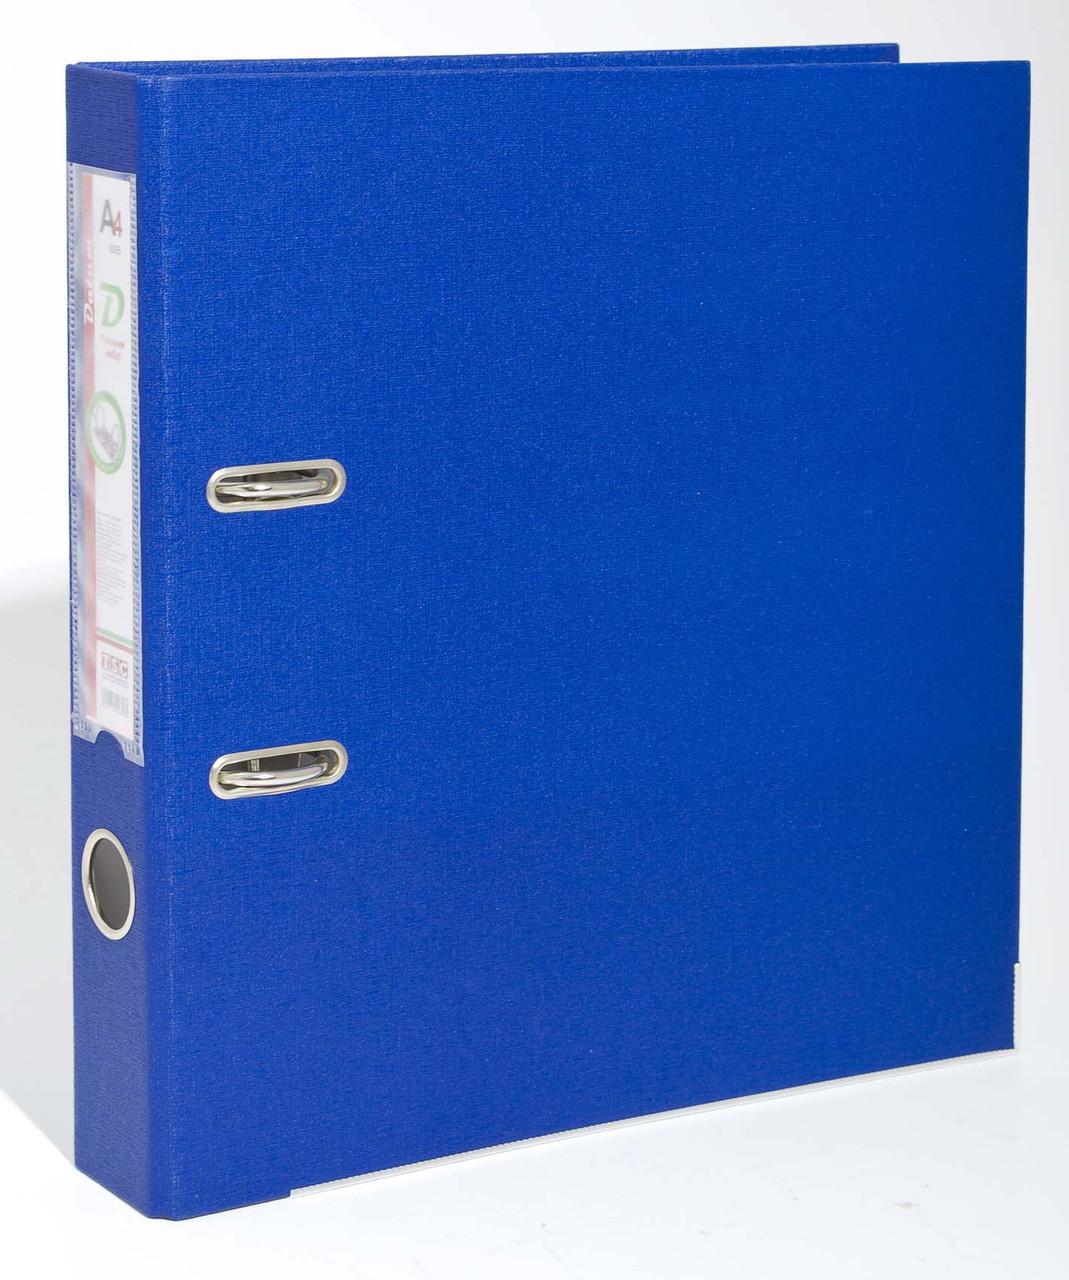 Сегрегатор А4/5см темно-синий D2260-04 (сборной)